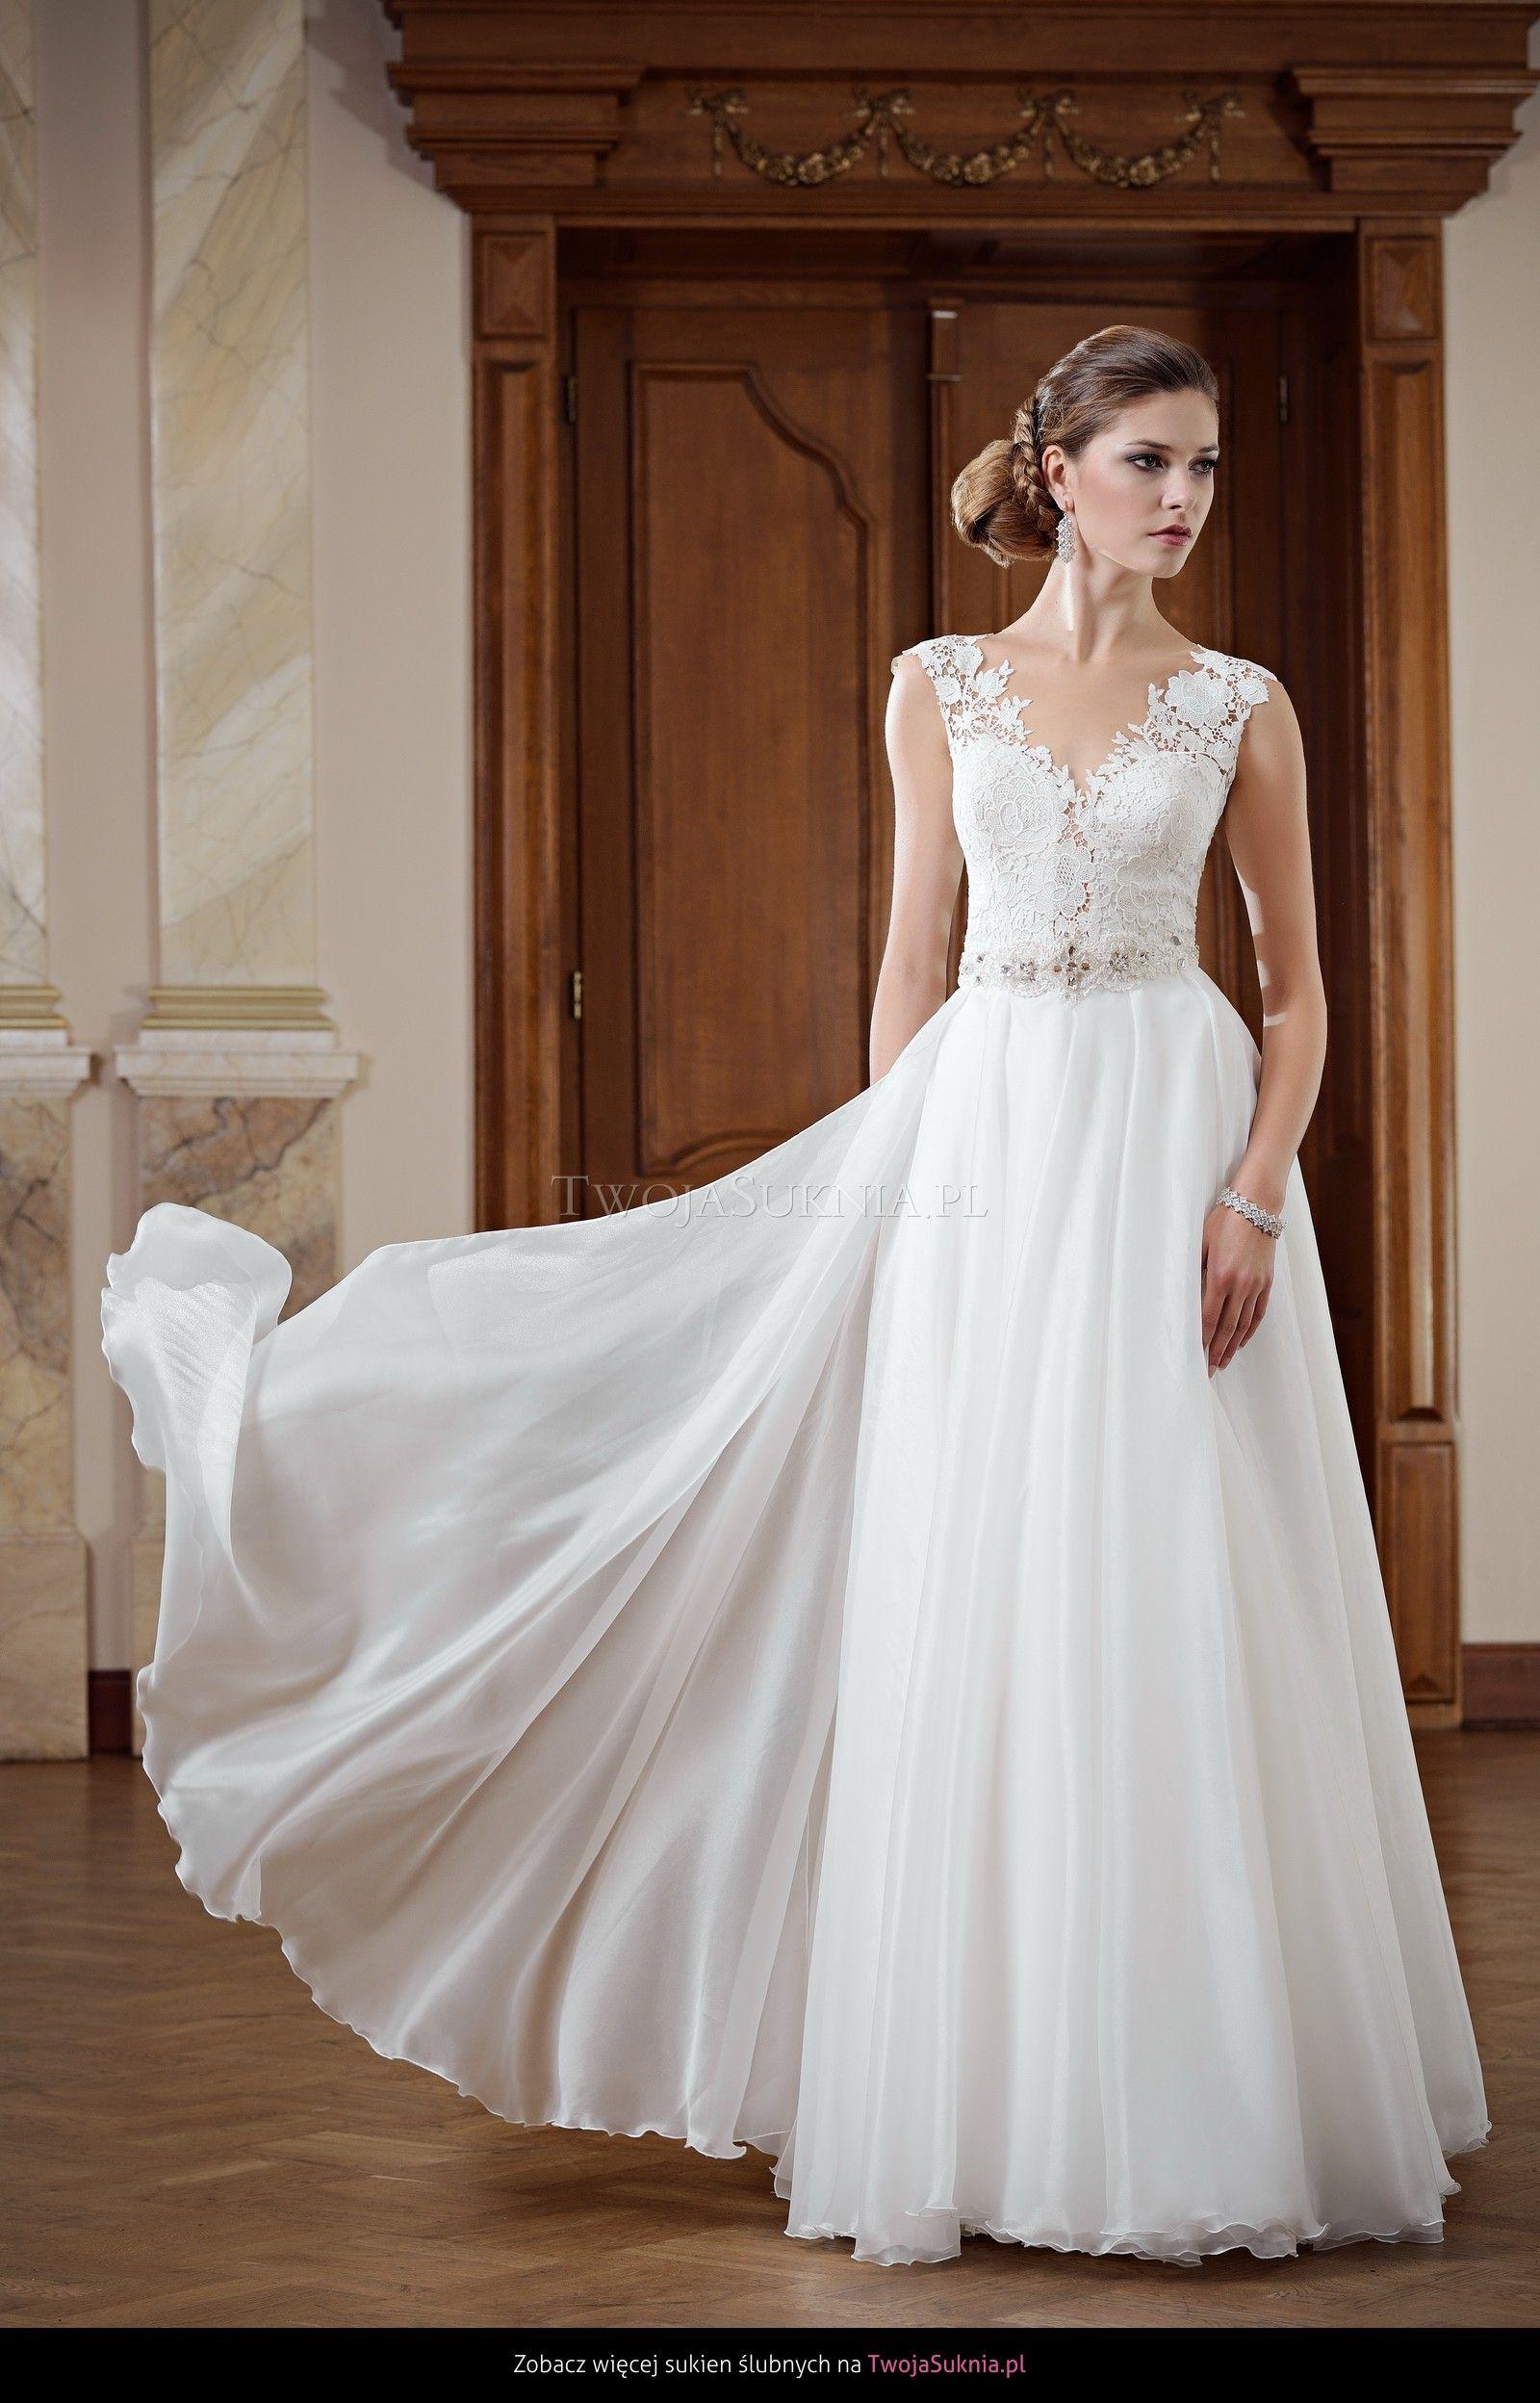 Suknia Slubna Igar Hermiona Glamour Twojasuknia Pl Dresses Wedding Dresses Glamour